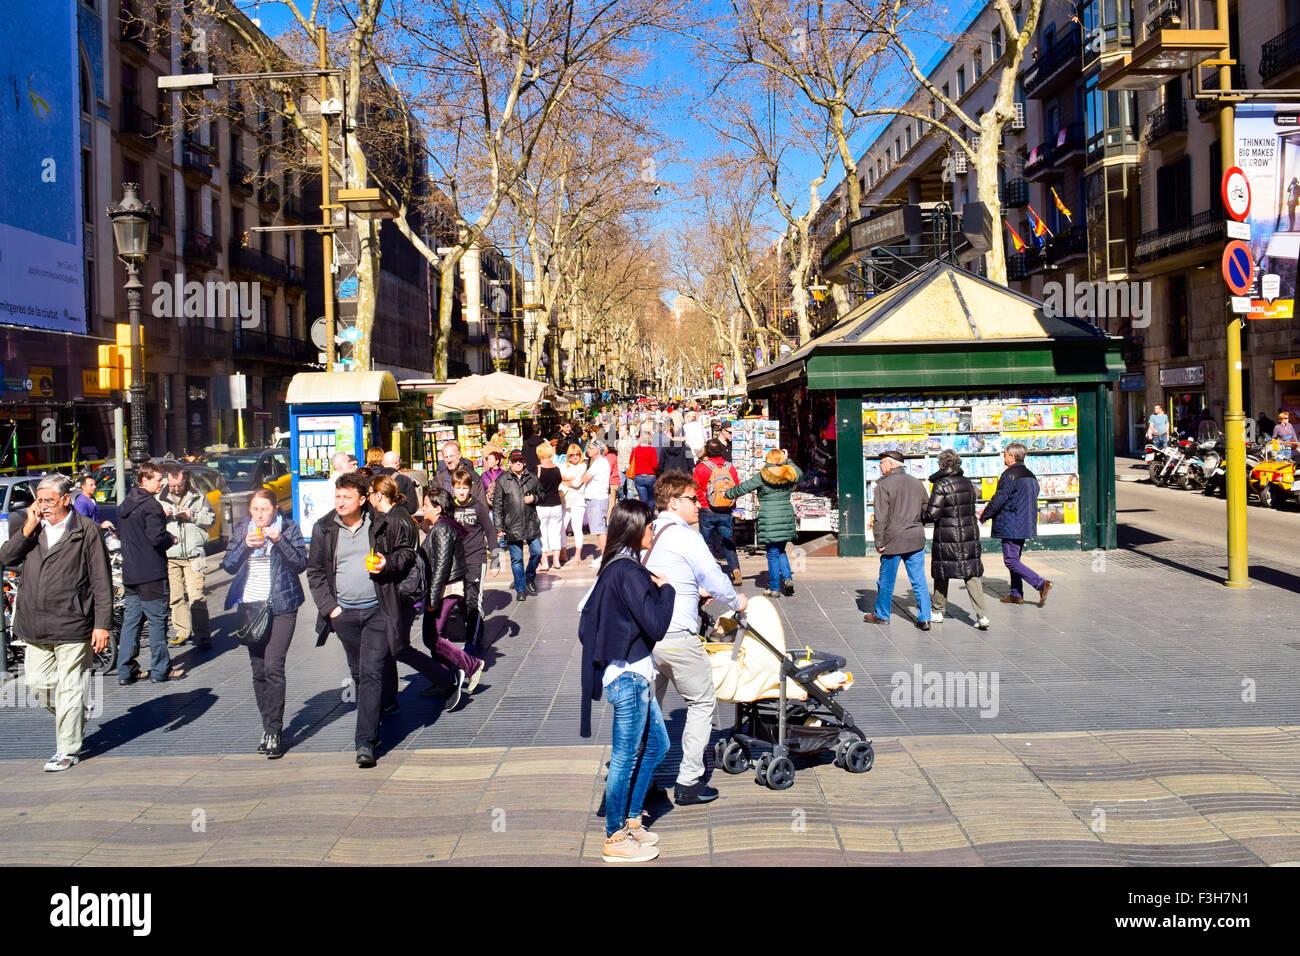 People walking along La Rambla. Barcelona, Catalonia, Spain. Stock Photo